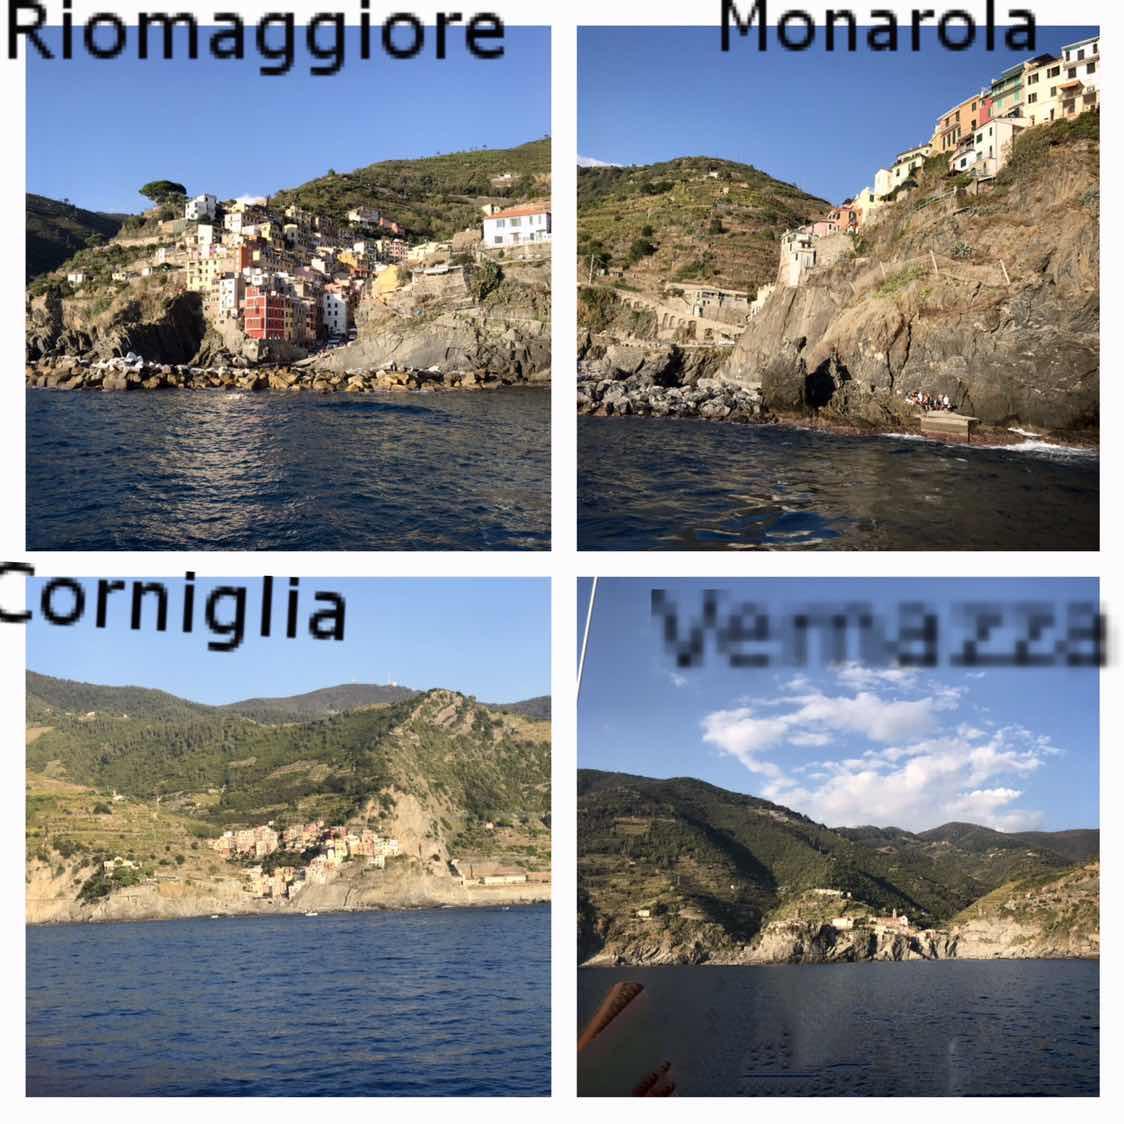 4 of 5 villages